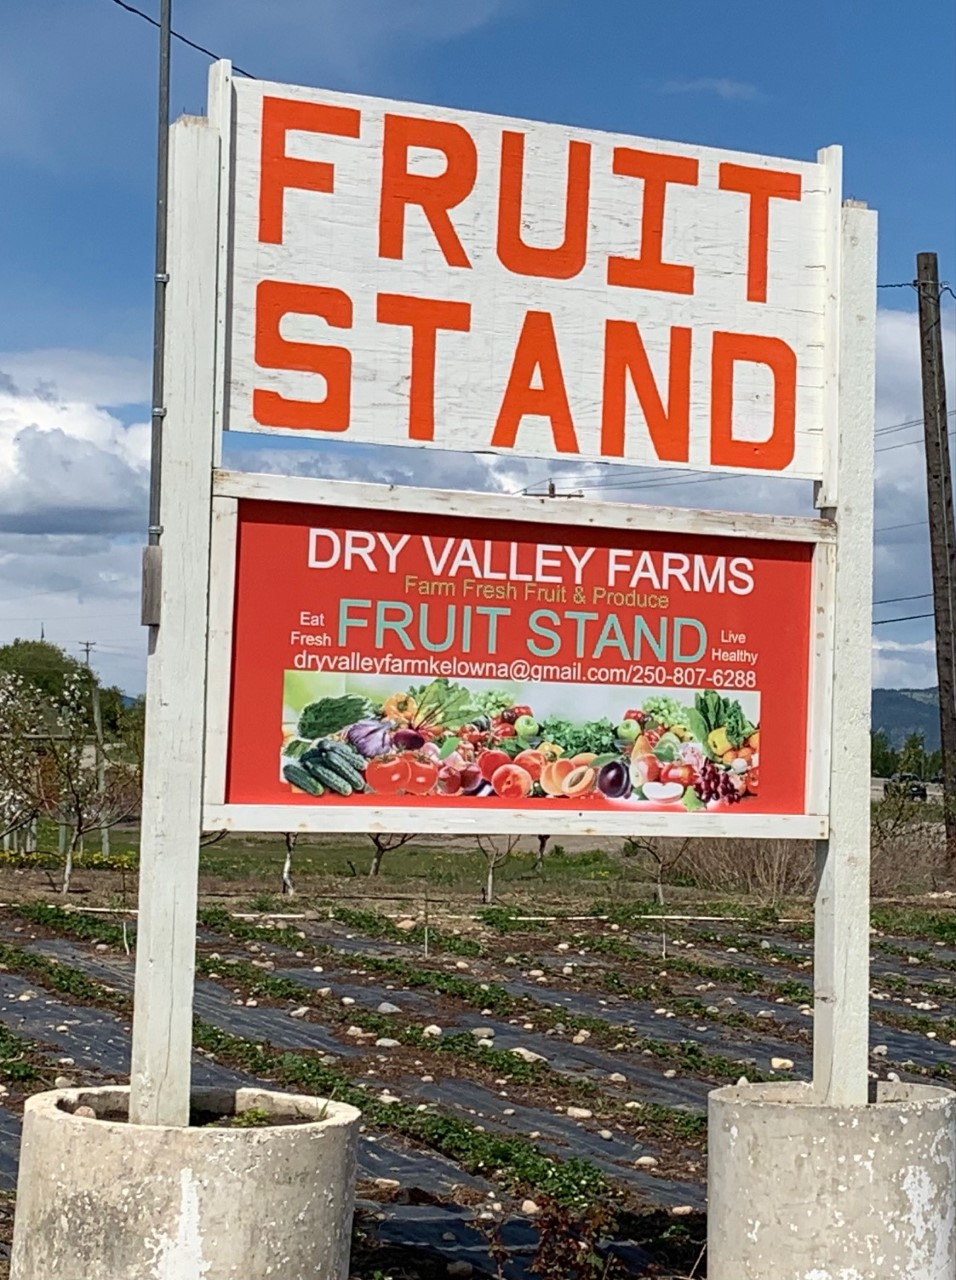 Small Business Spotlight: Dry Valley Farms